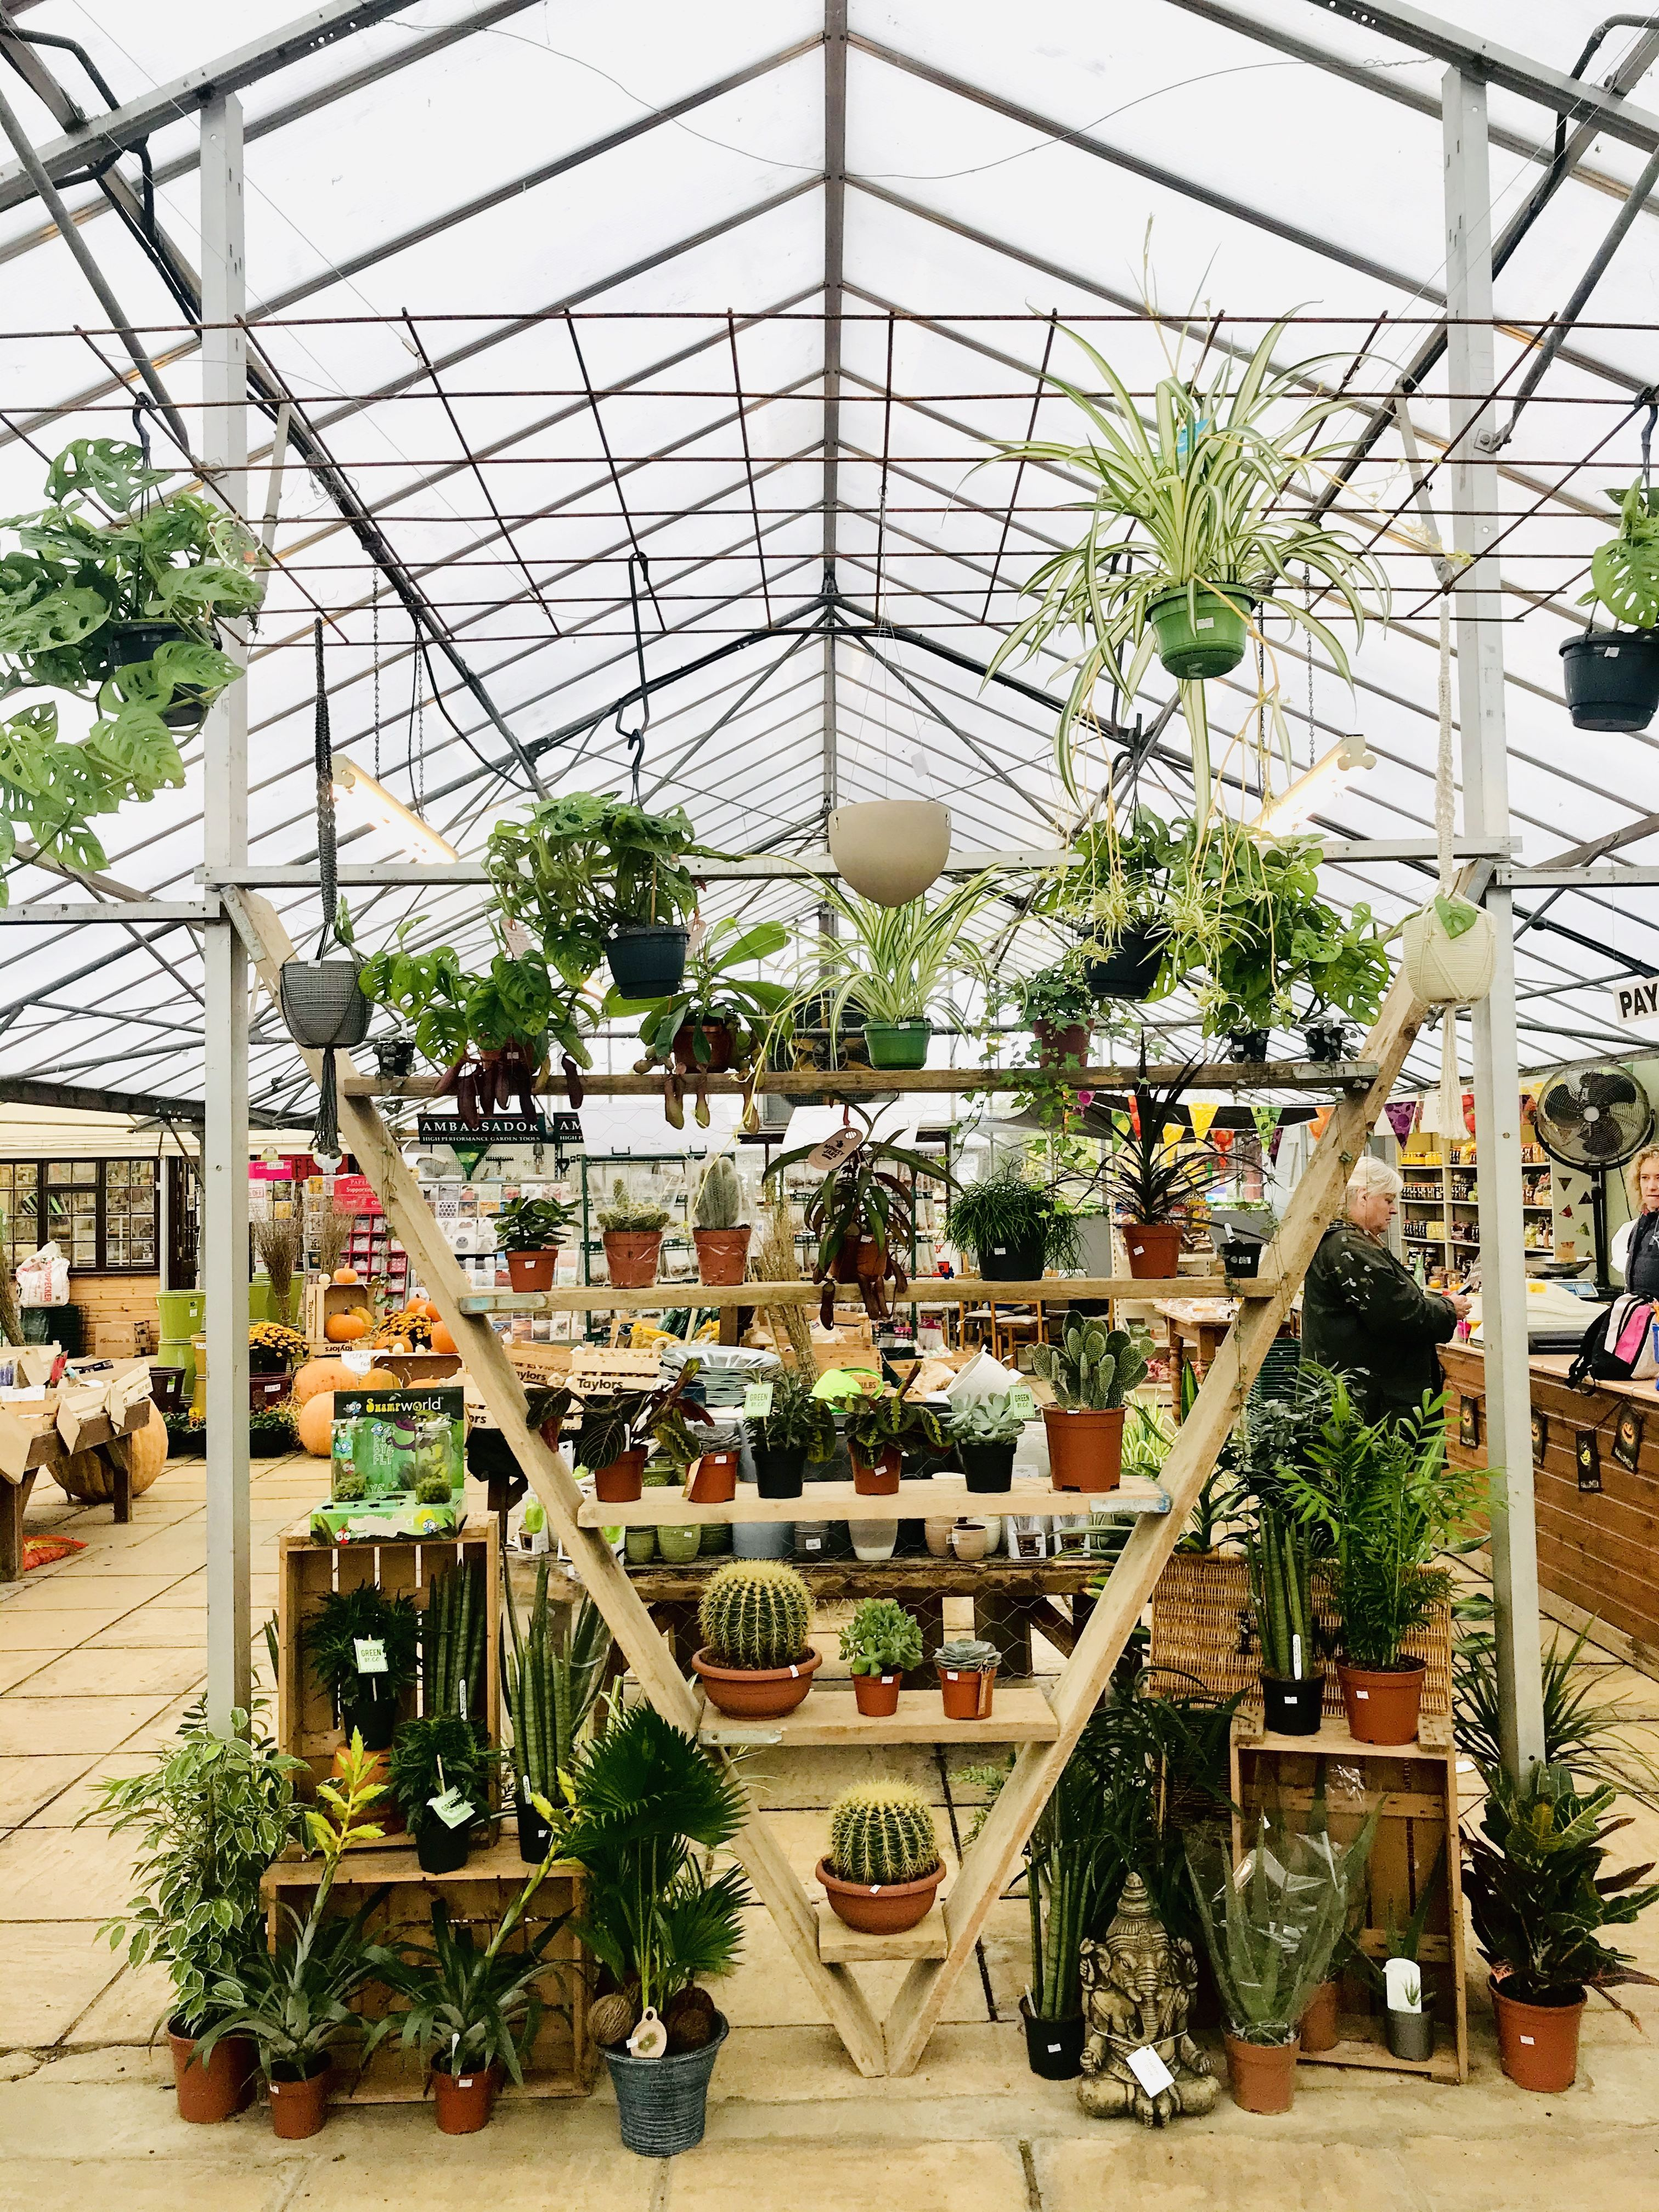 So Much Effort And Work Has Gone Into This Amazing Garden Centre Houseplant Display Garden Center Displays Garden Center Indoor Plants